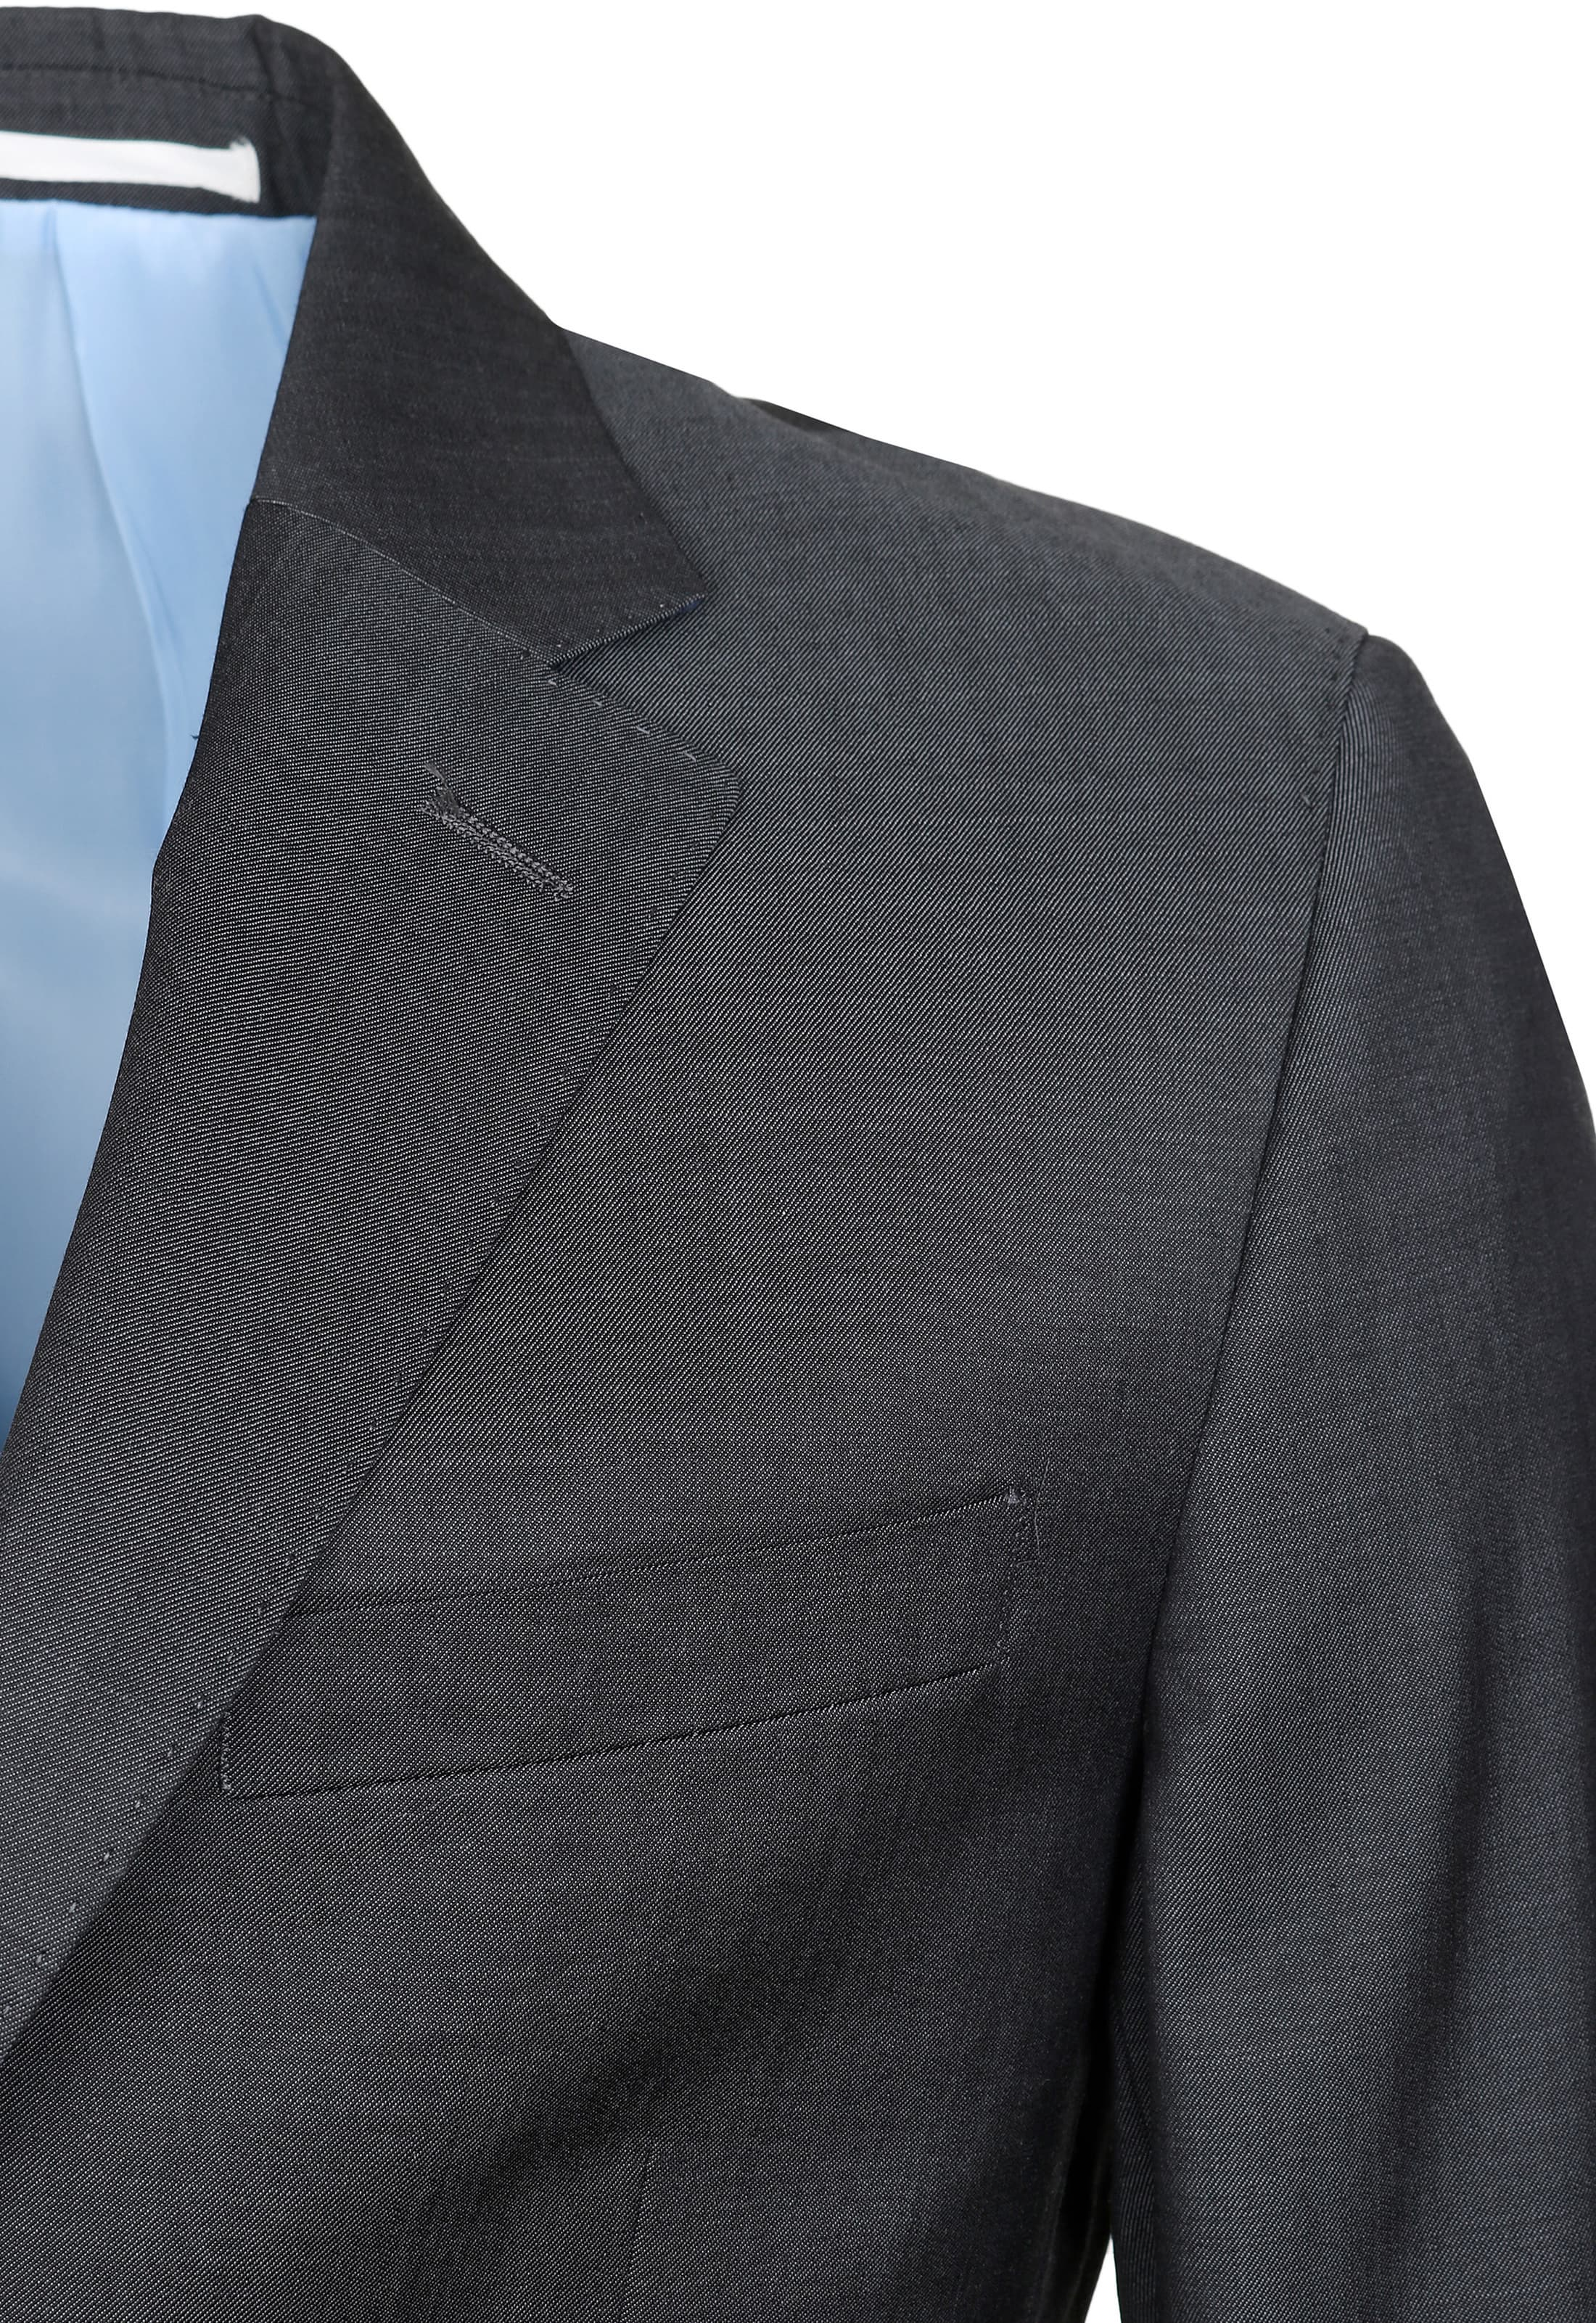 Suitable Anzug Strato Dunkelgrau foto 3